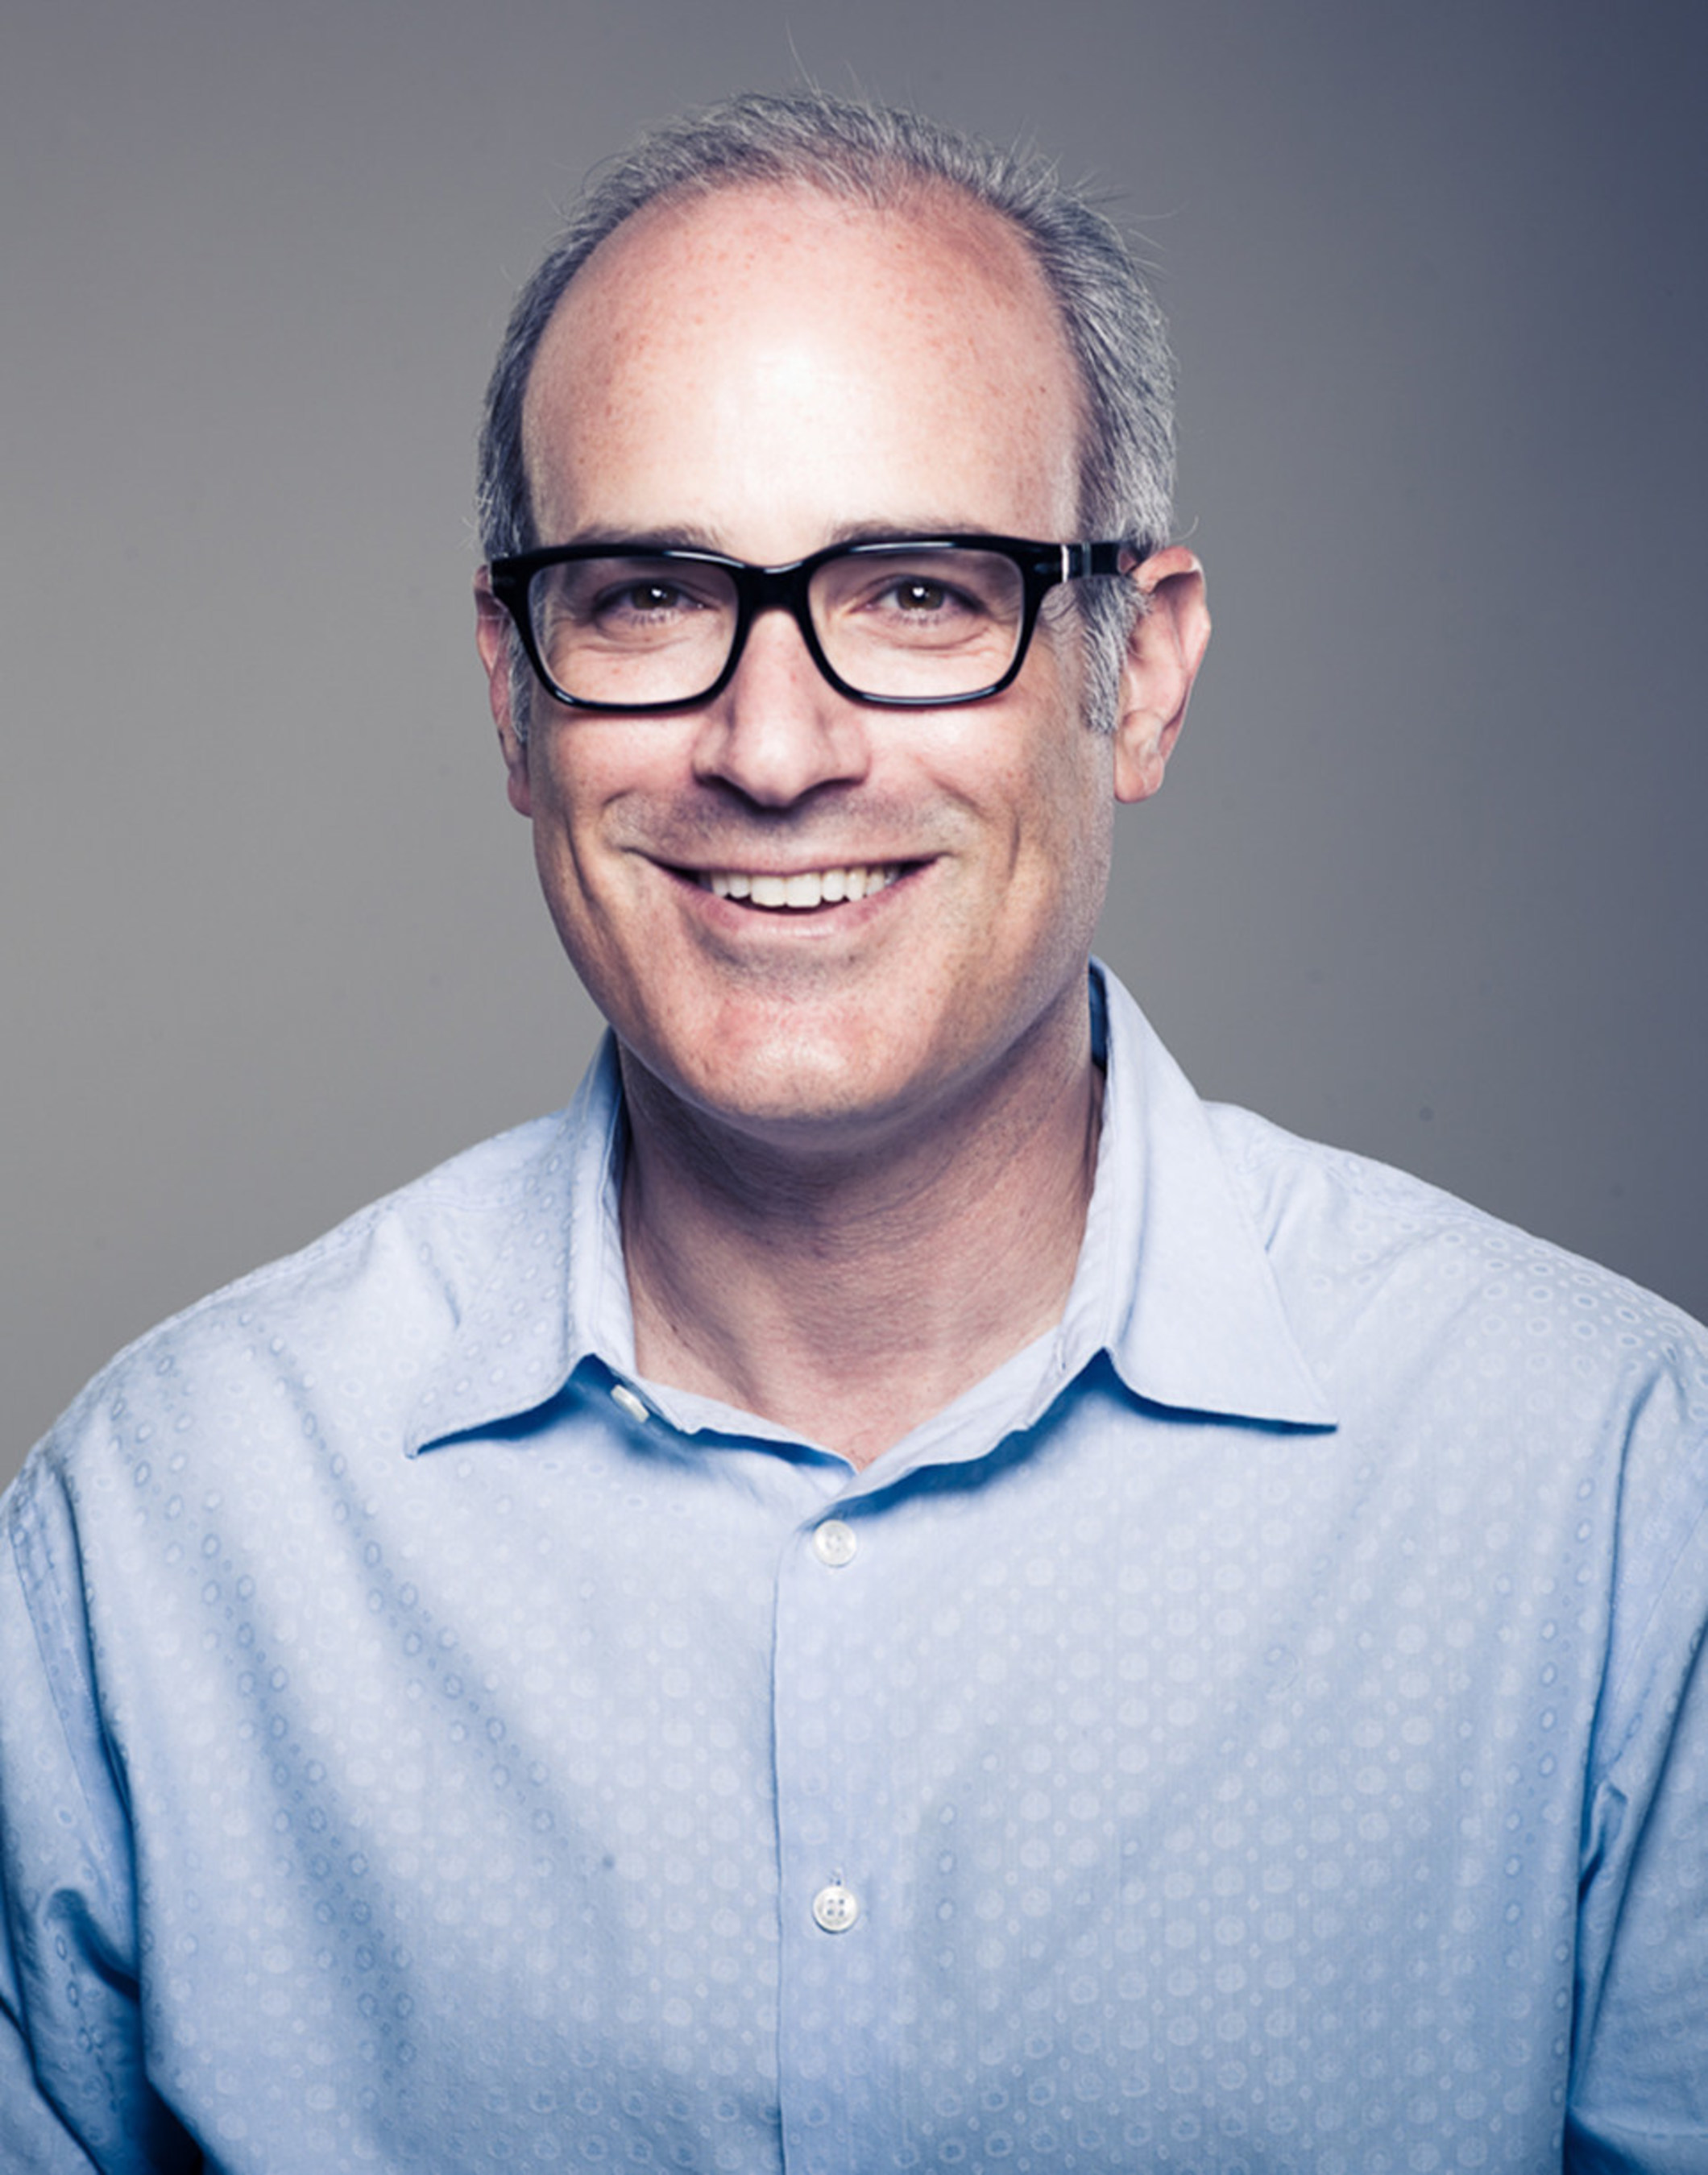 Paul Silverman Named Lead on Lexus Account, Head of New Team One Texas Office.